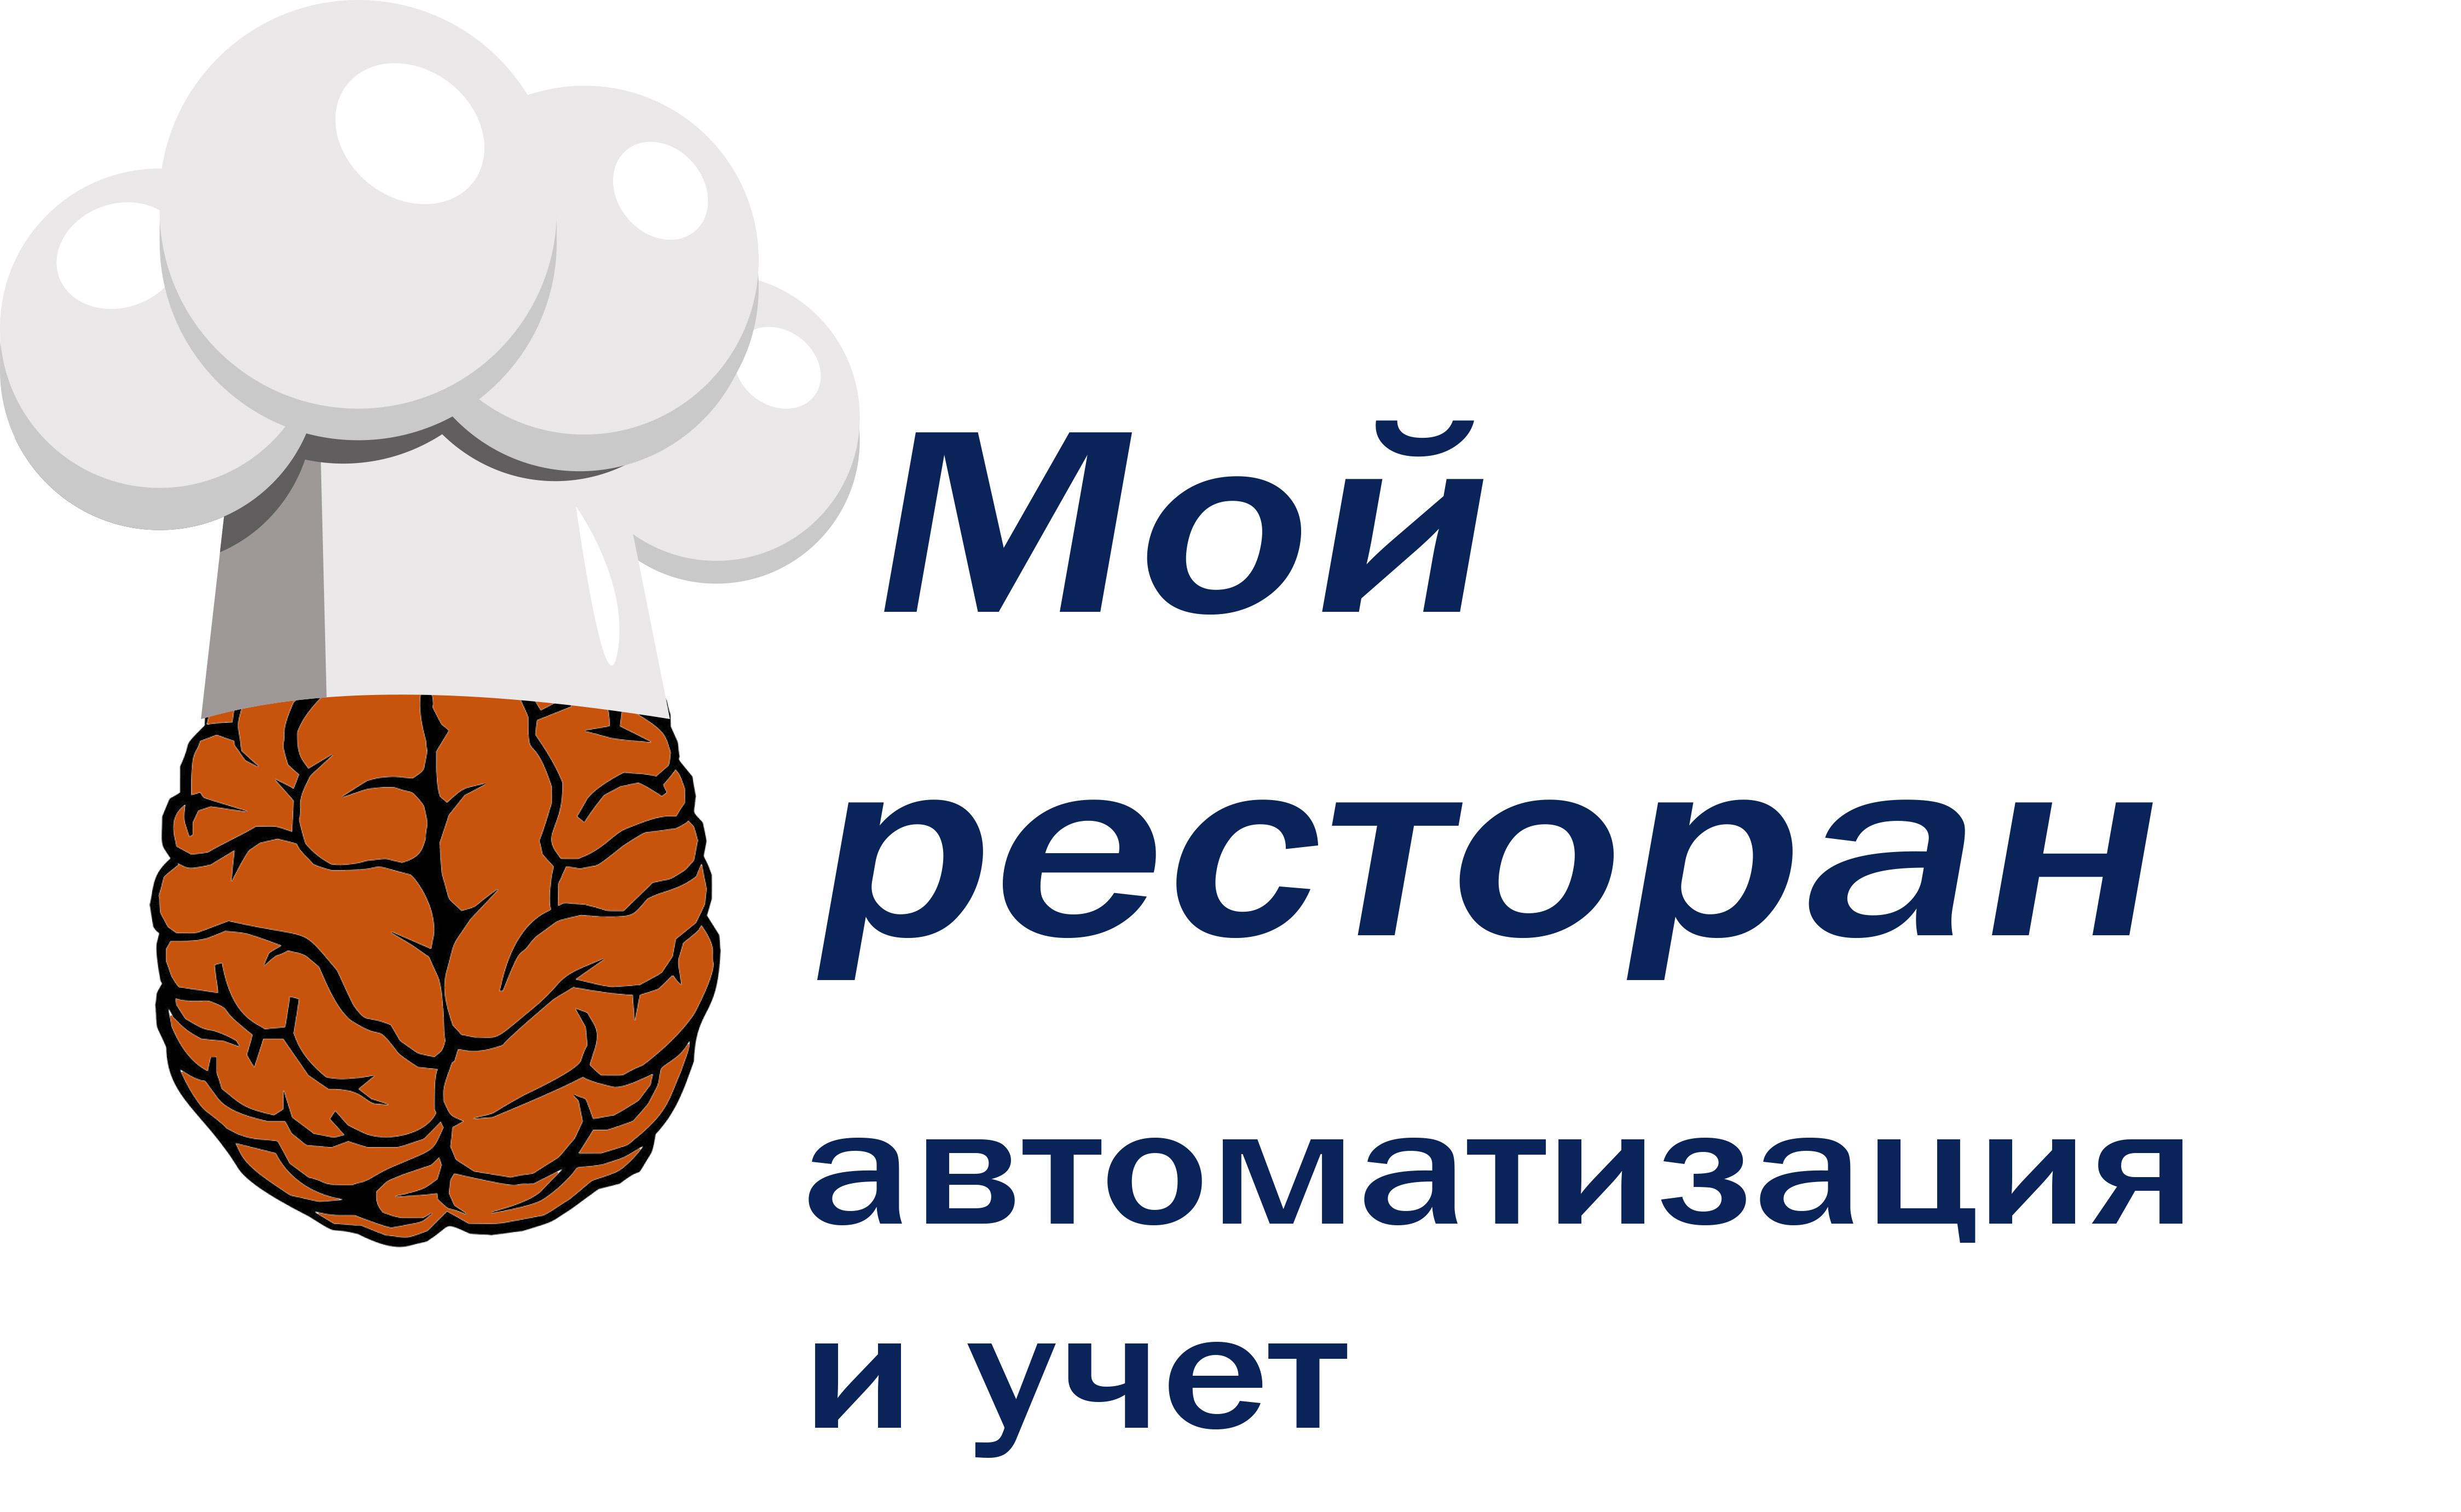 Разработать логотип и фавикон для IT- компании фото f_9885d5413d1cec50.jpg